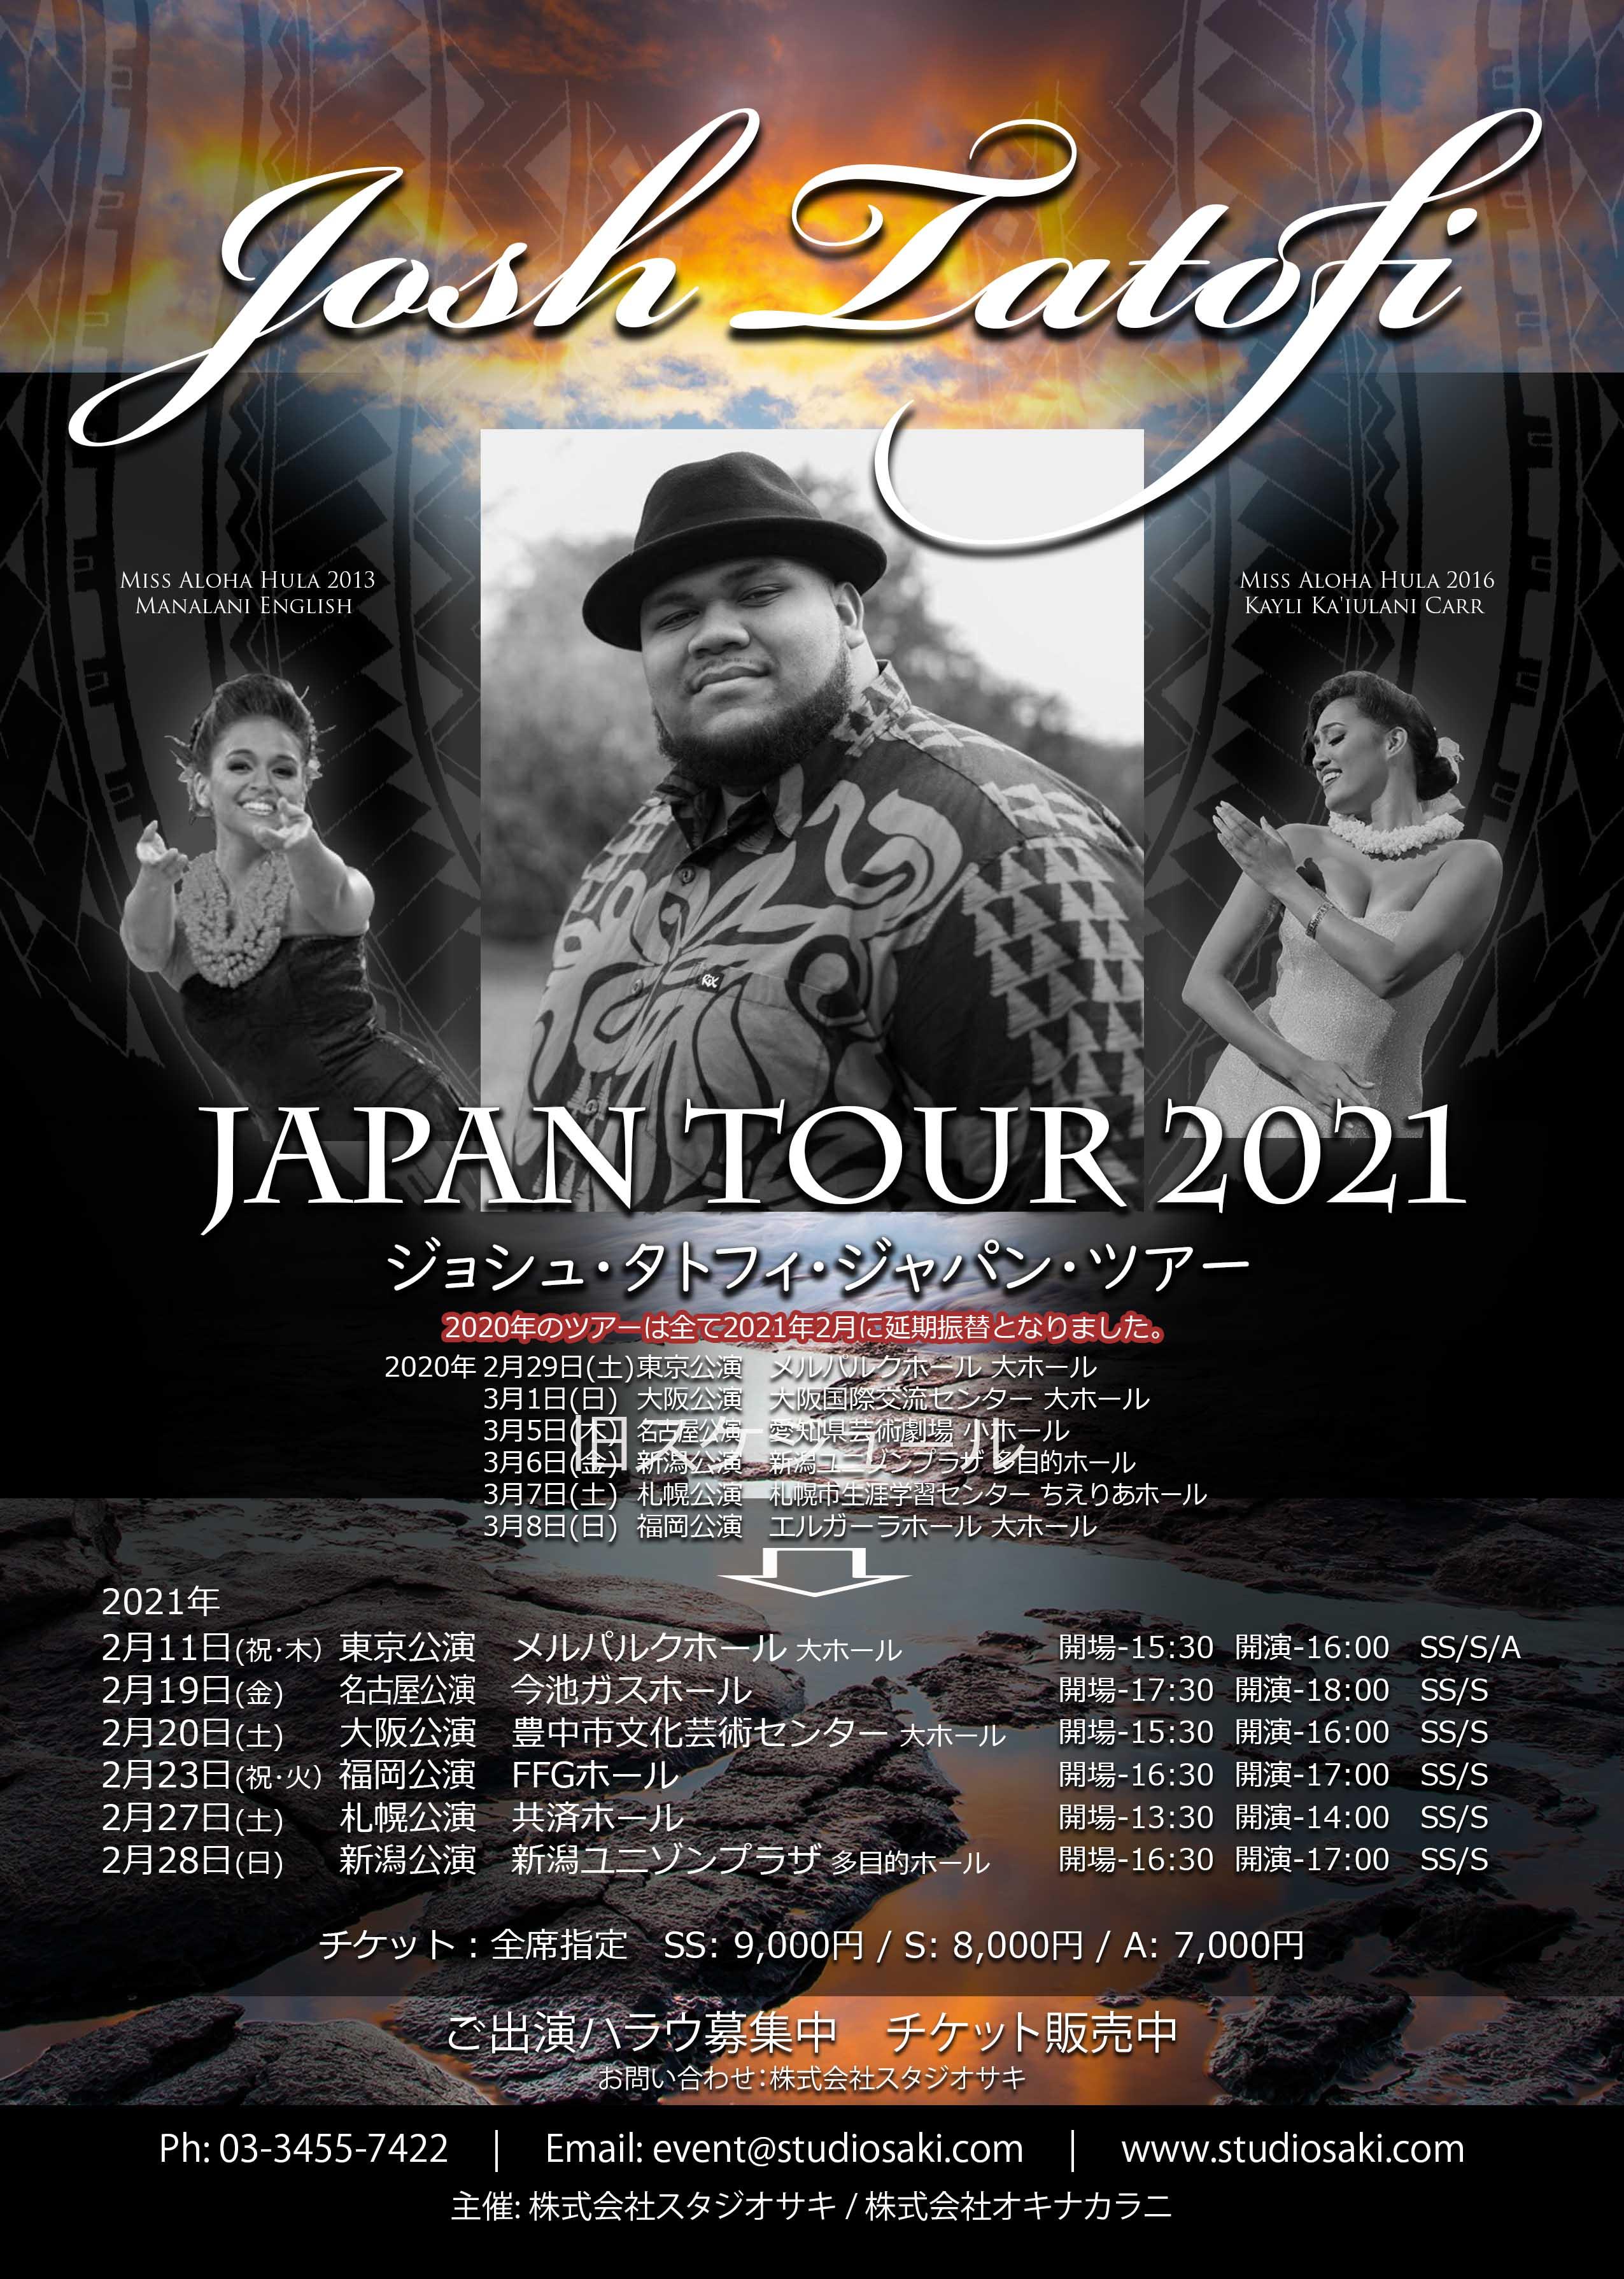 Josh Tatofi Japan Tour 2021